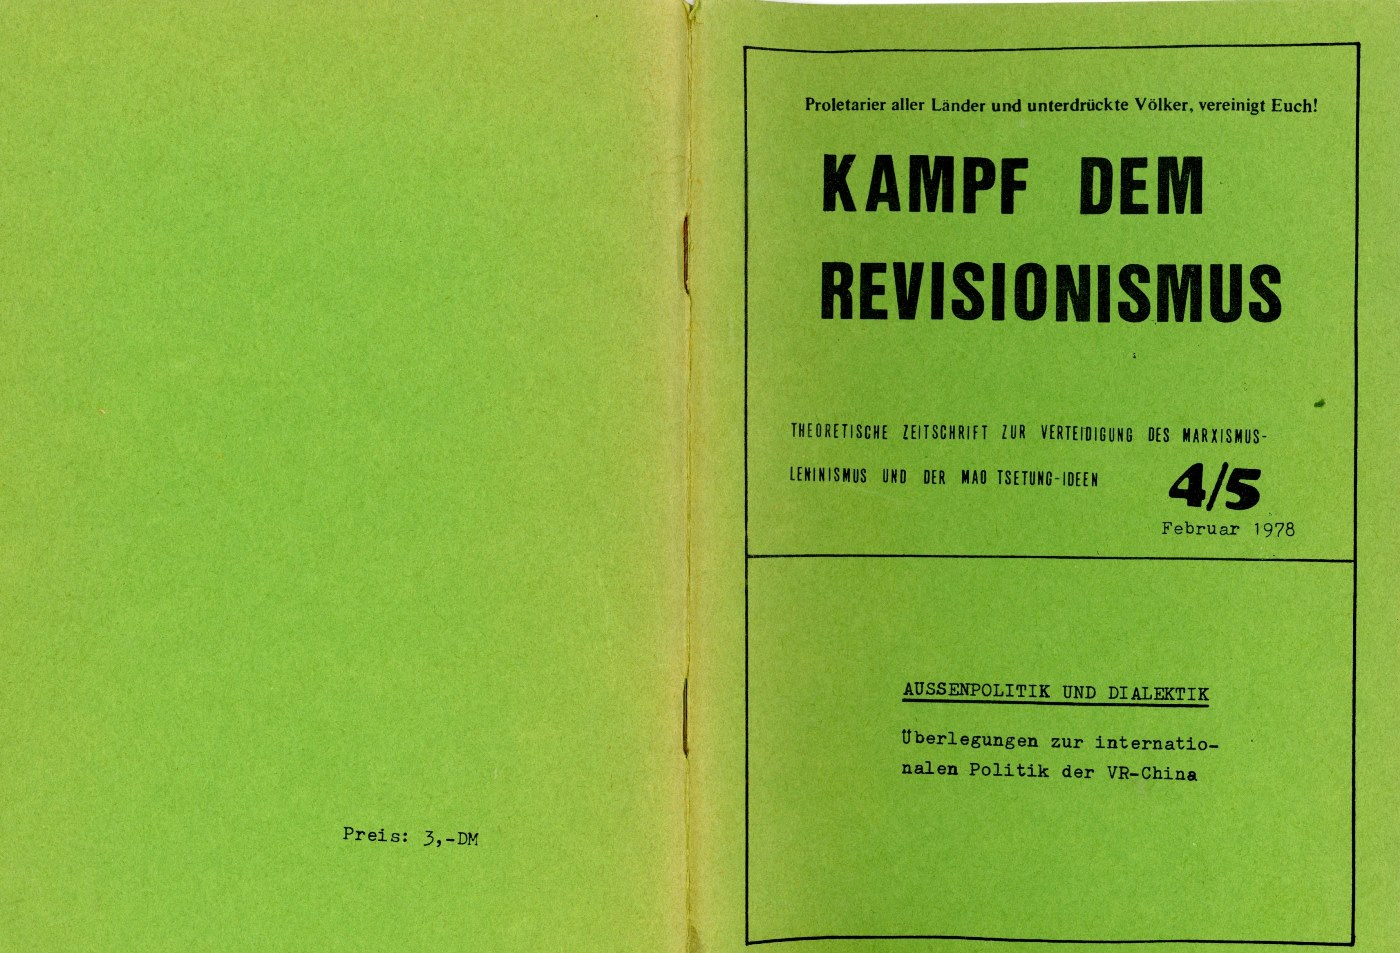 Muenchen_Kampf_dem_Revisionismus_1978_04_05_01